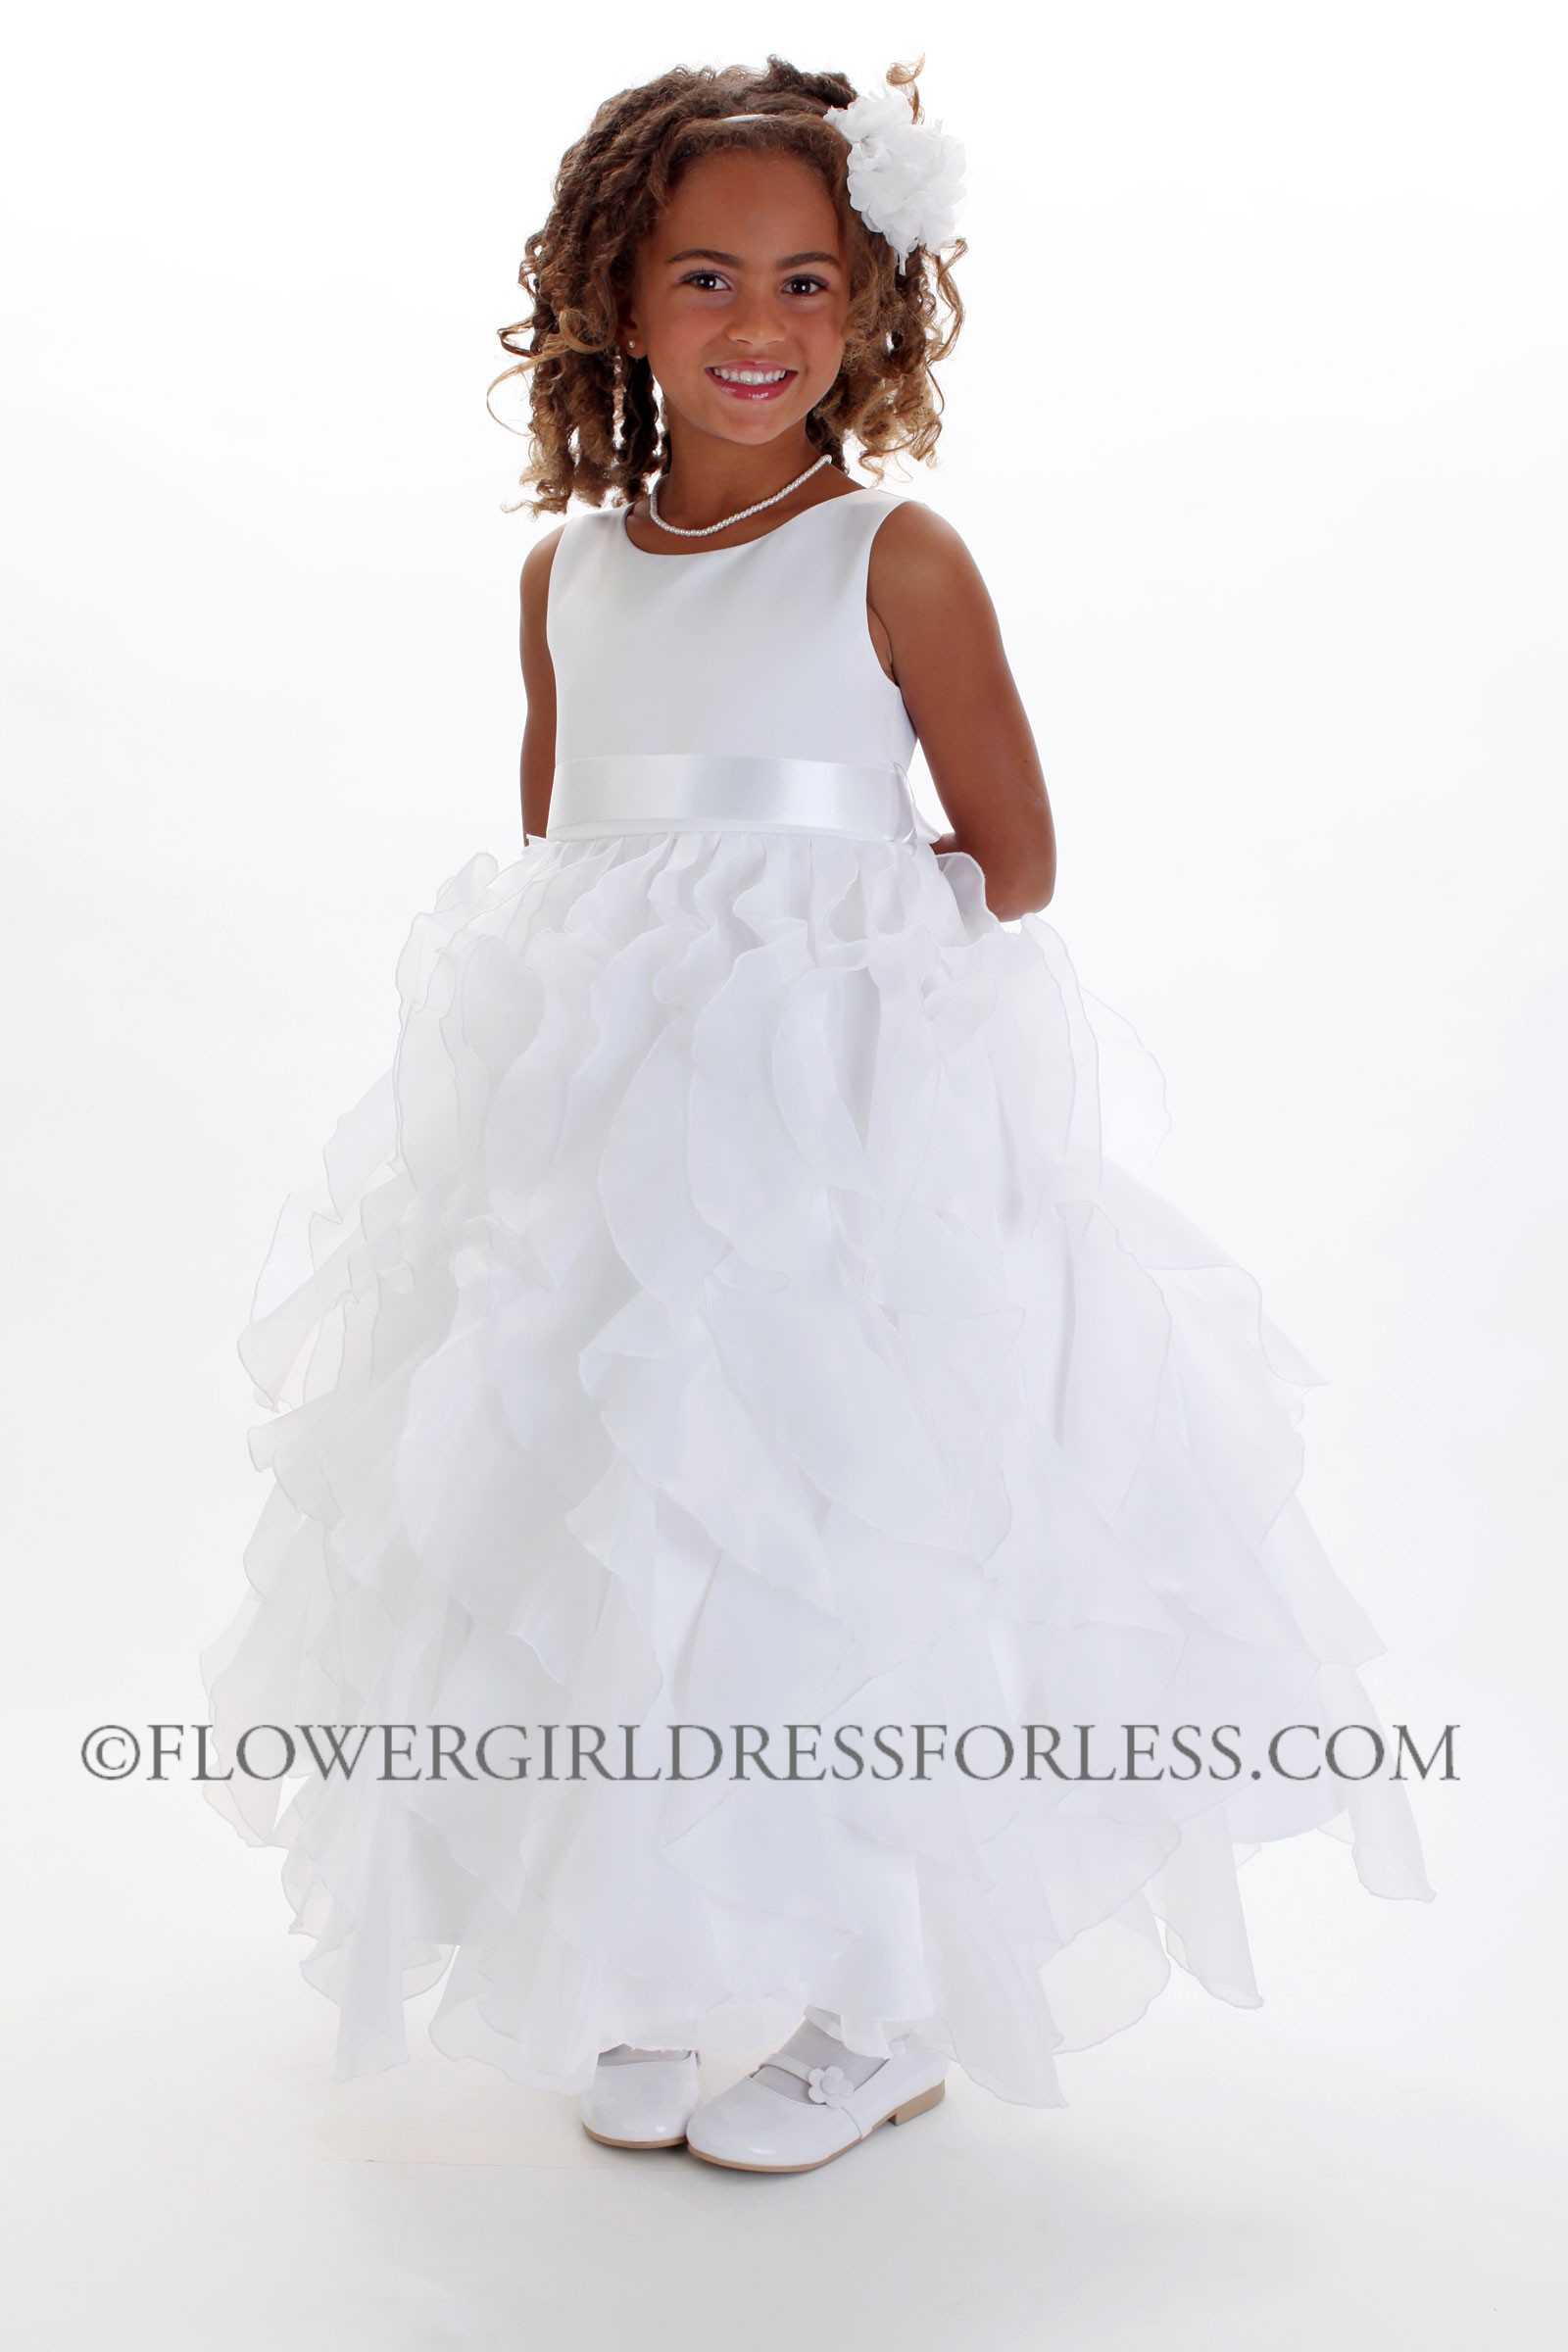 munion Dresses Ivory Dresses Dresses Style Enlarging Preview Girls Dre